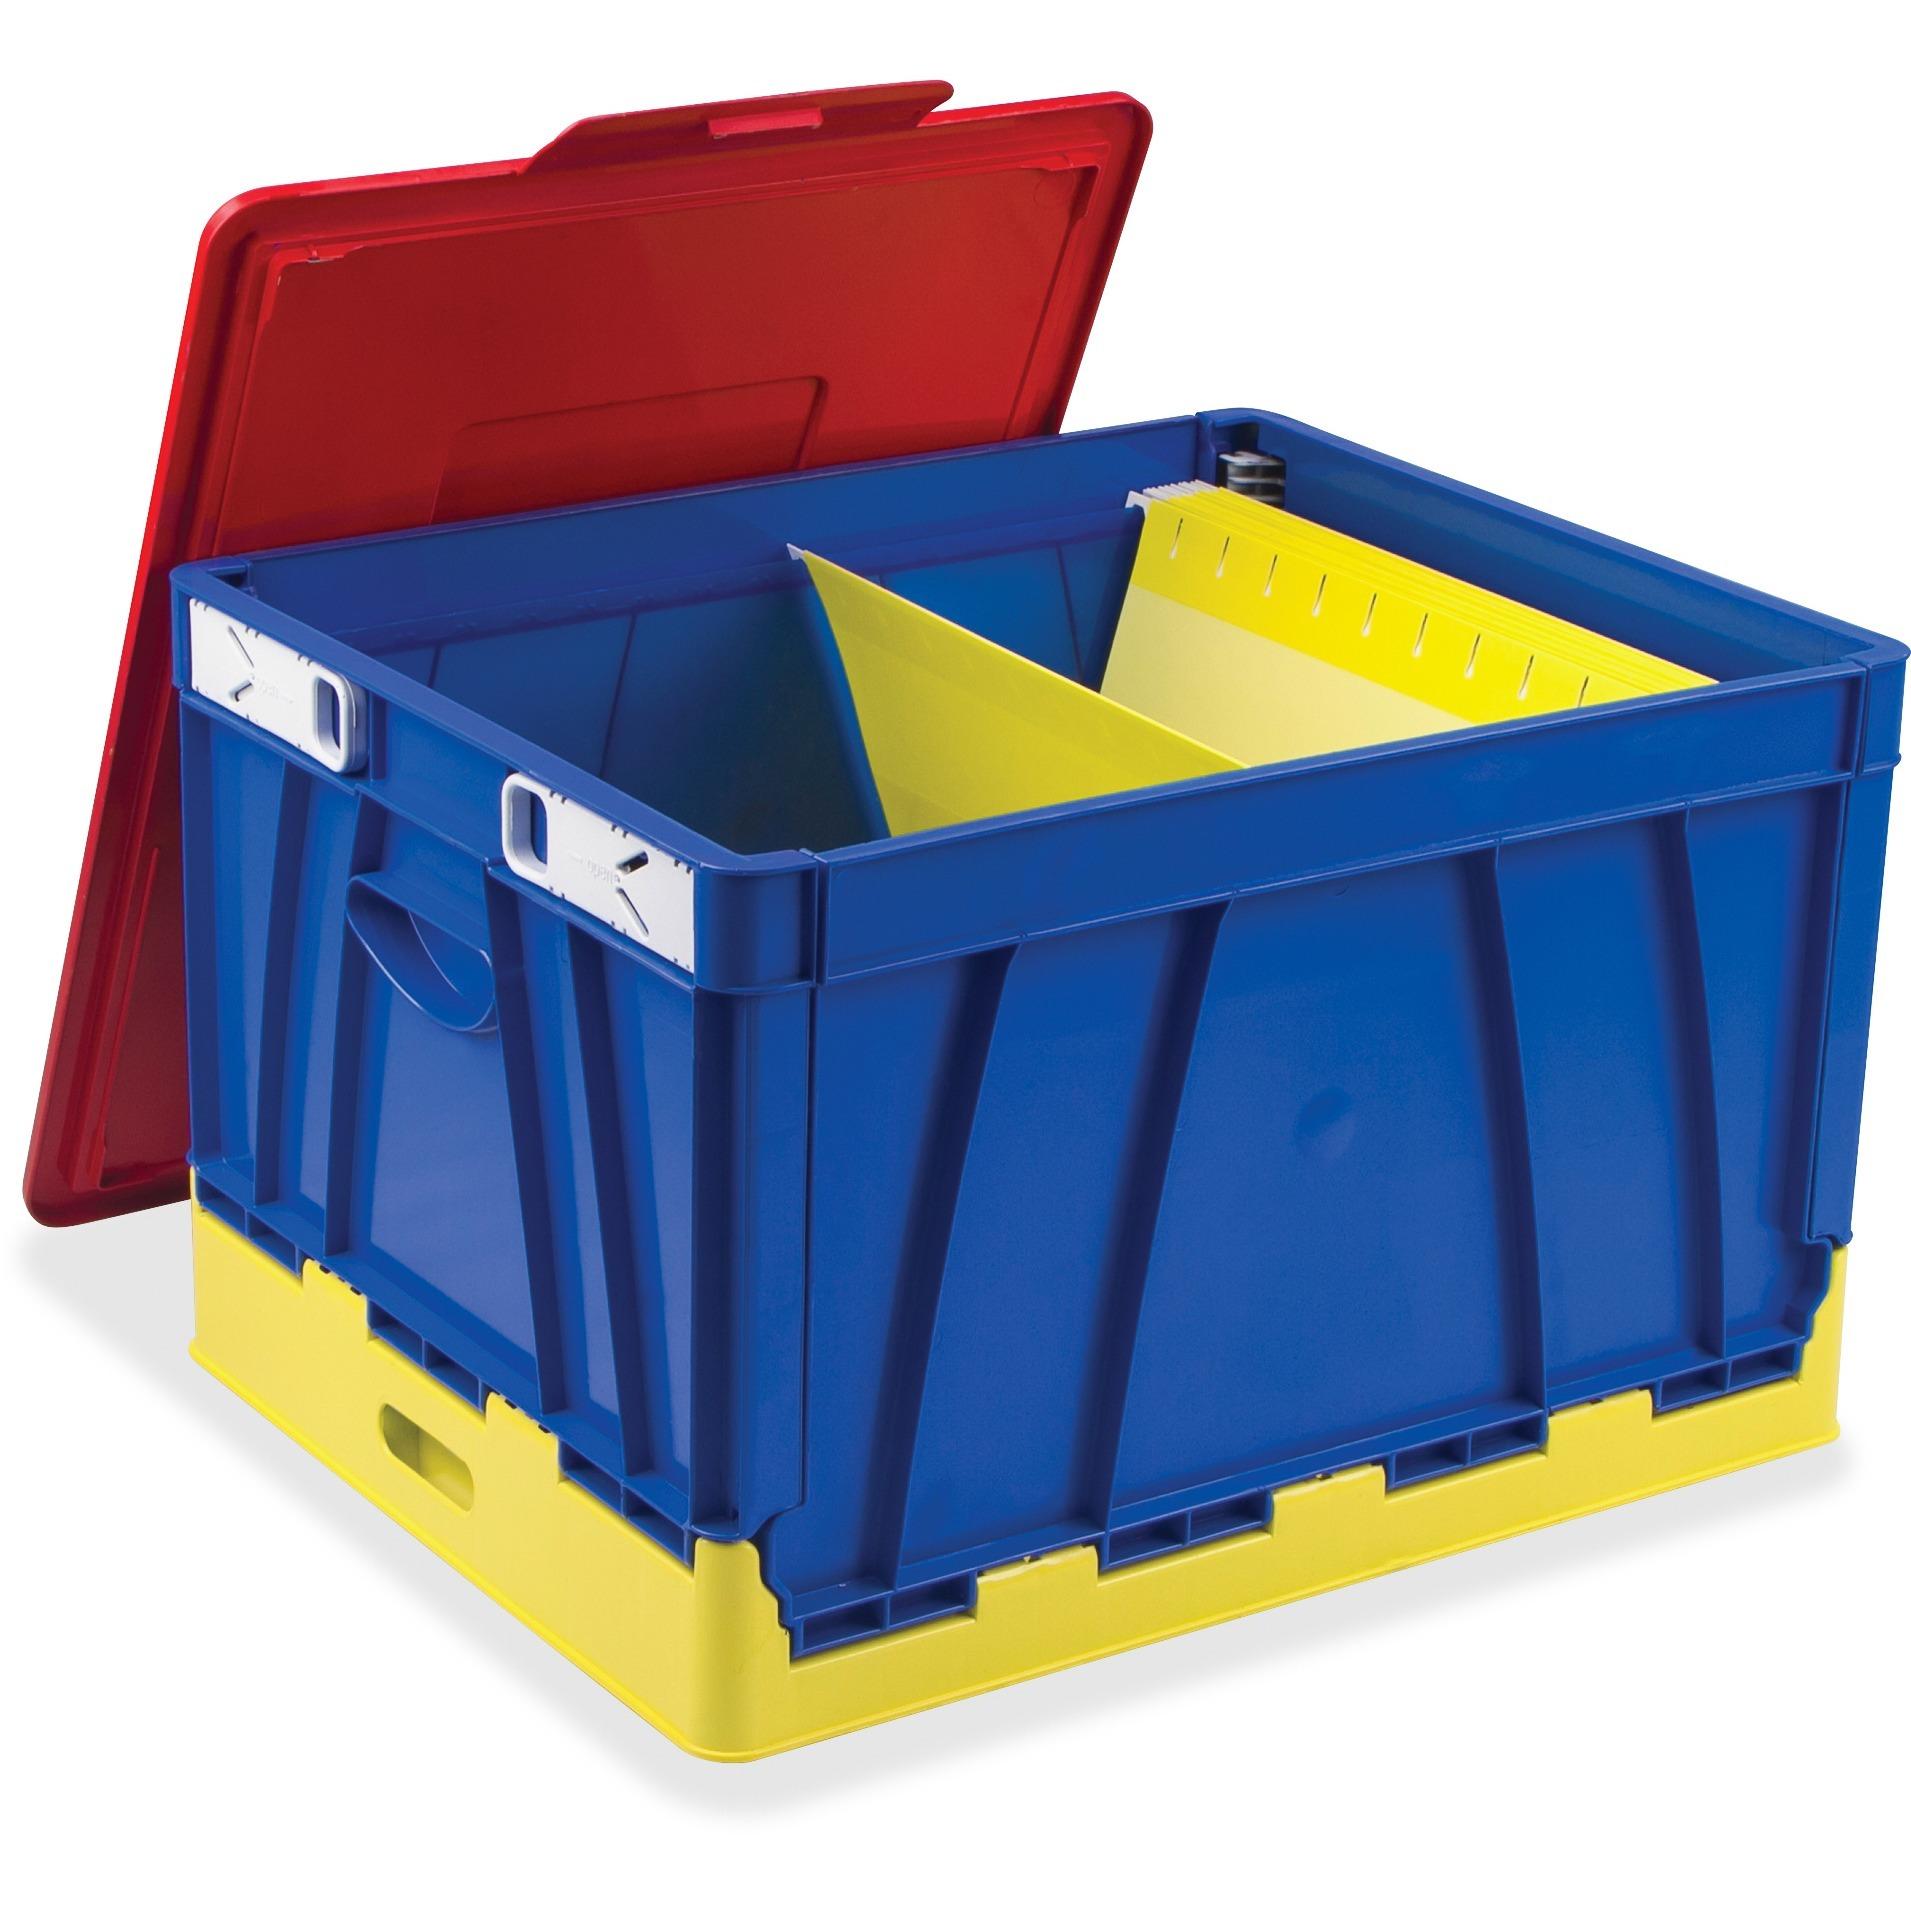 Storex, STX61818E04C, 4 Piece Collapsible Crates, 4 / Set, Red,Blue,Yellow